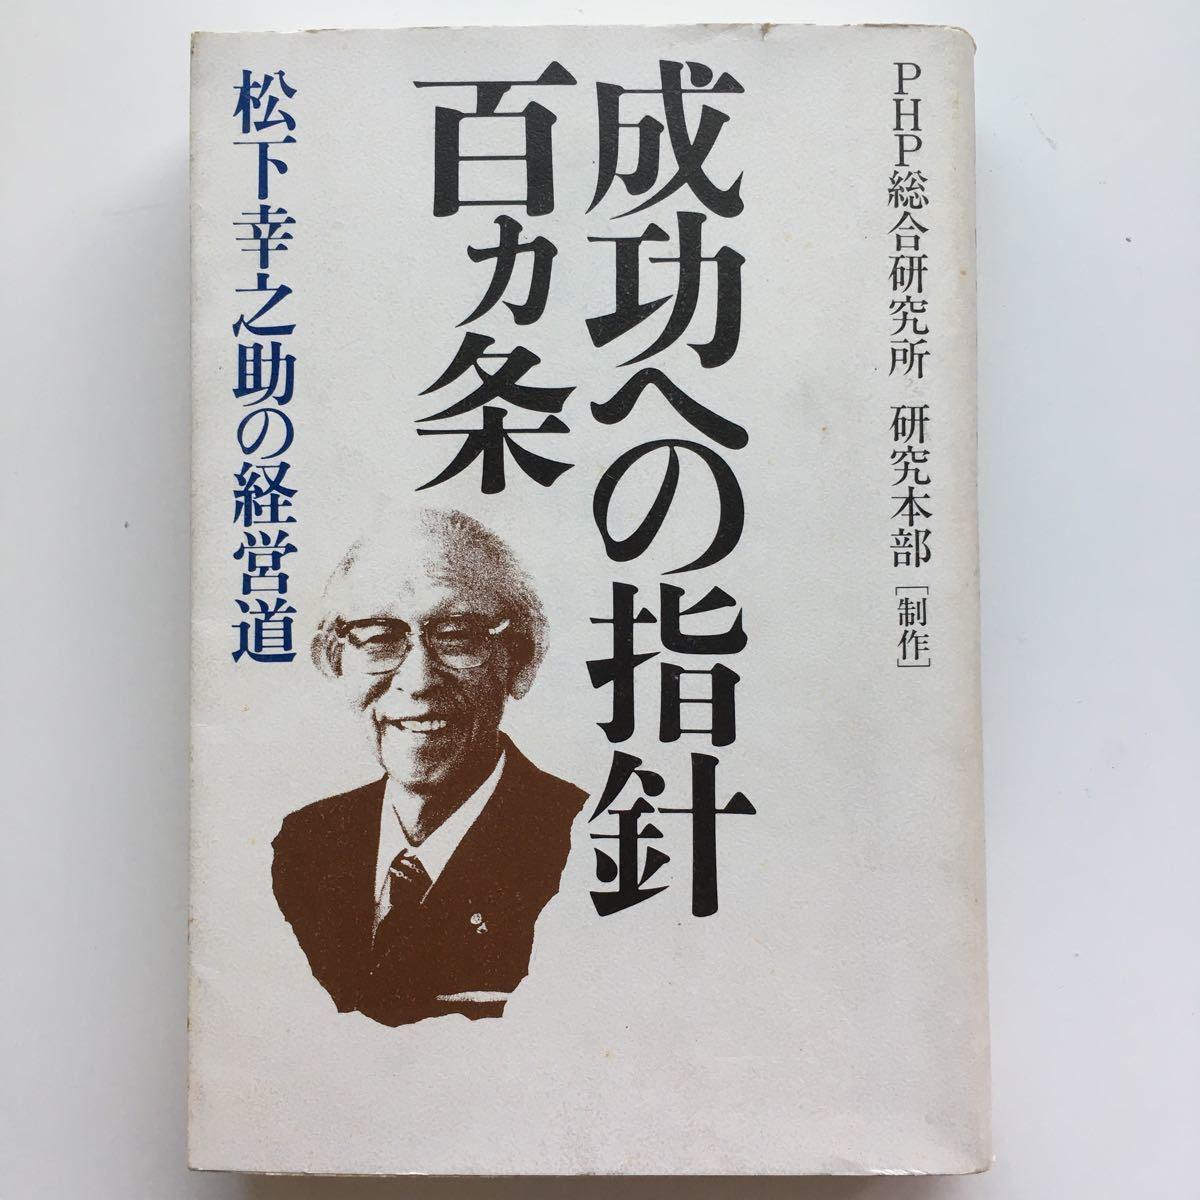 [第一版第一刷]成功への指針 百ヶ条 松下幸之助の経営道